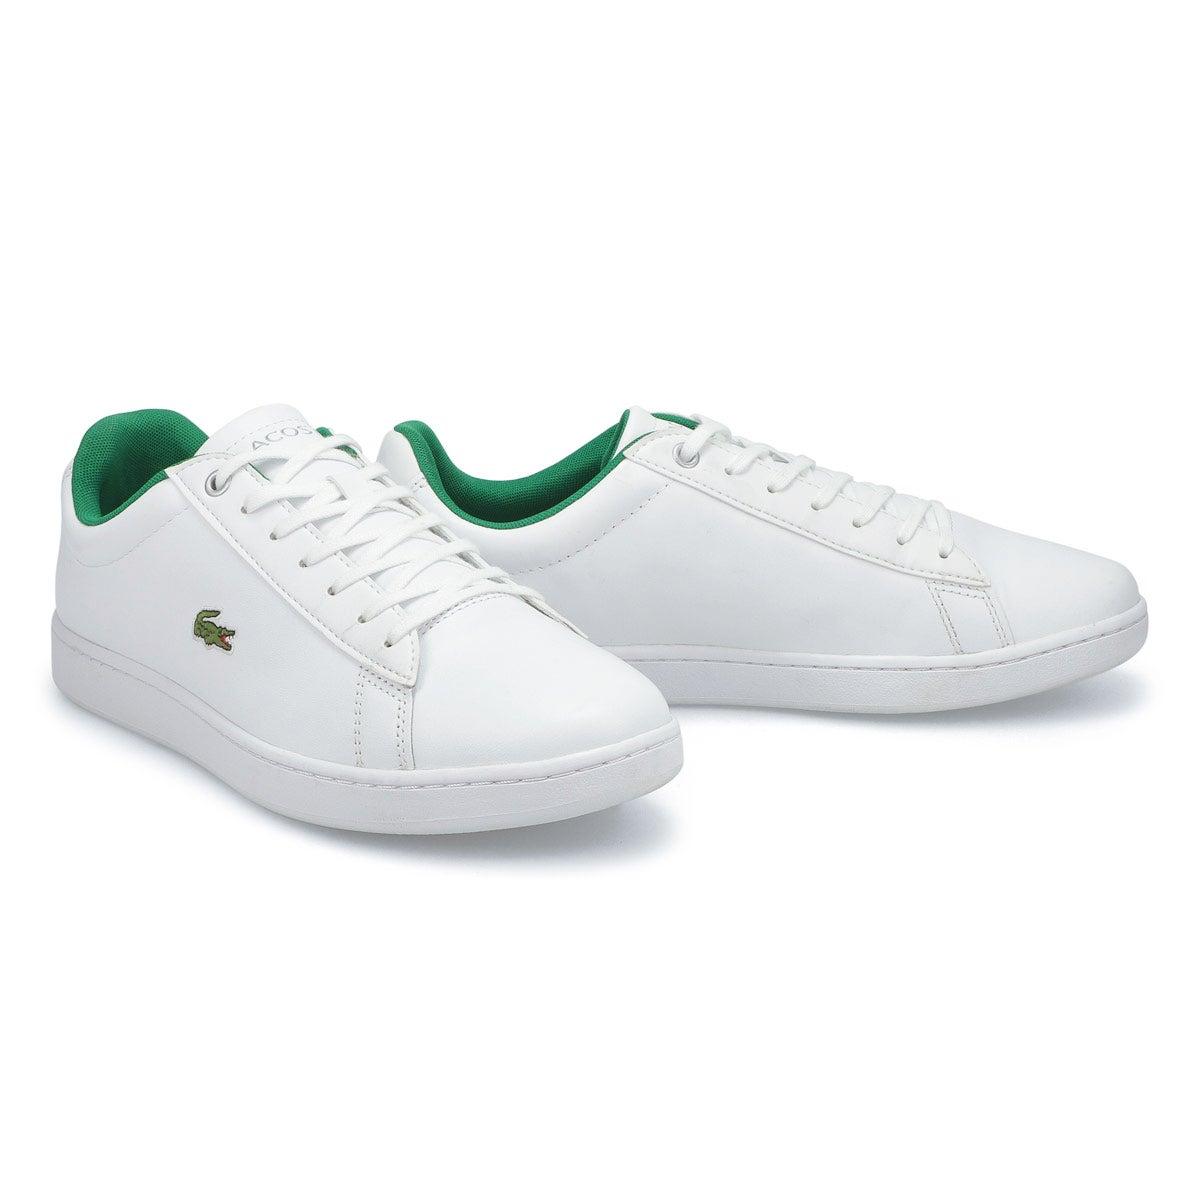 Hydez 119 1 P Fashion Sneaker | eBay